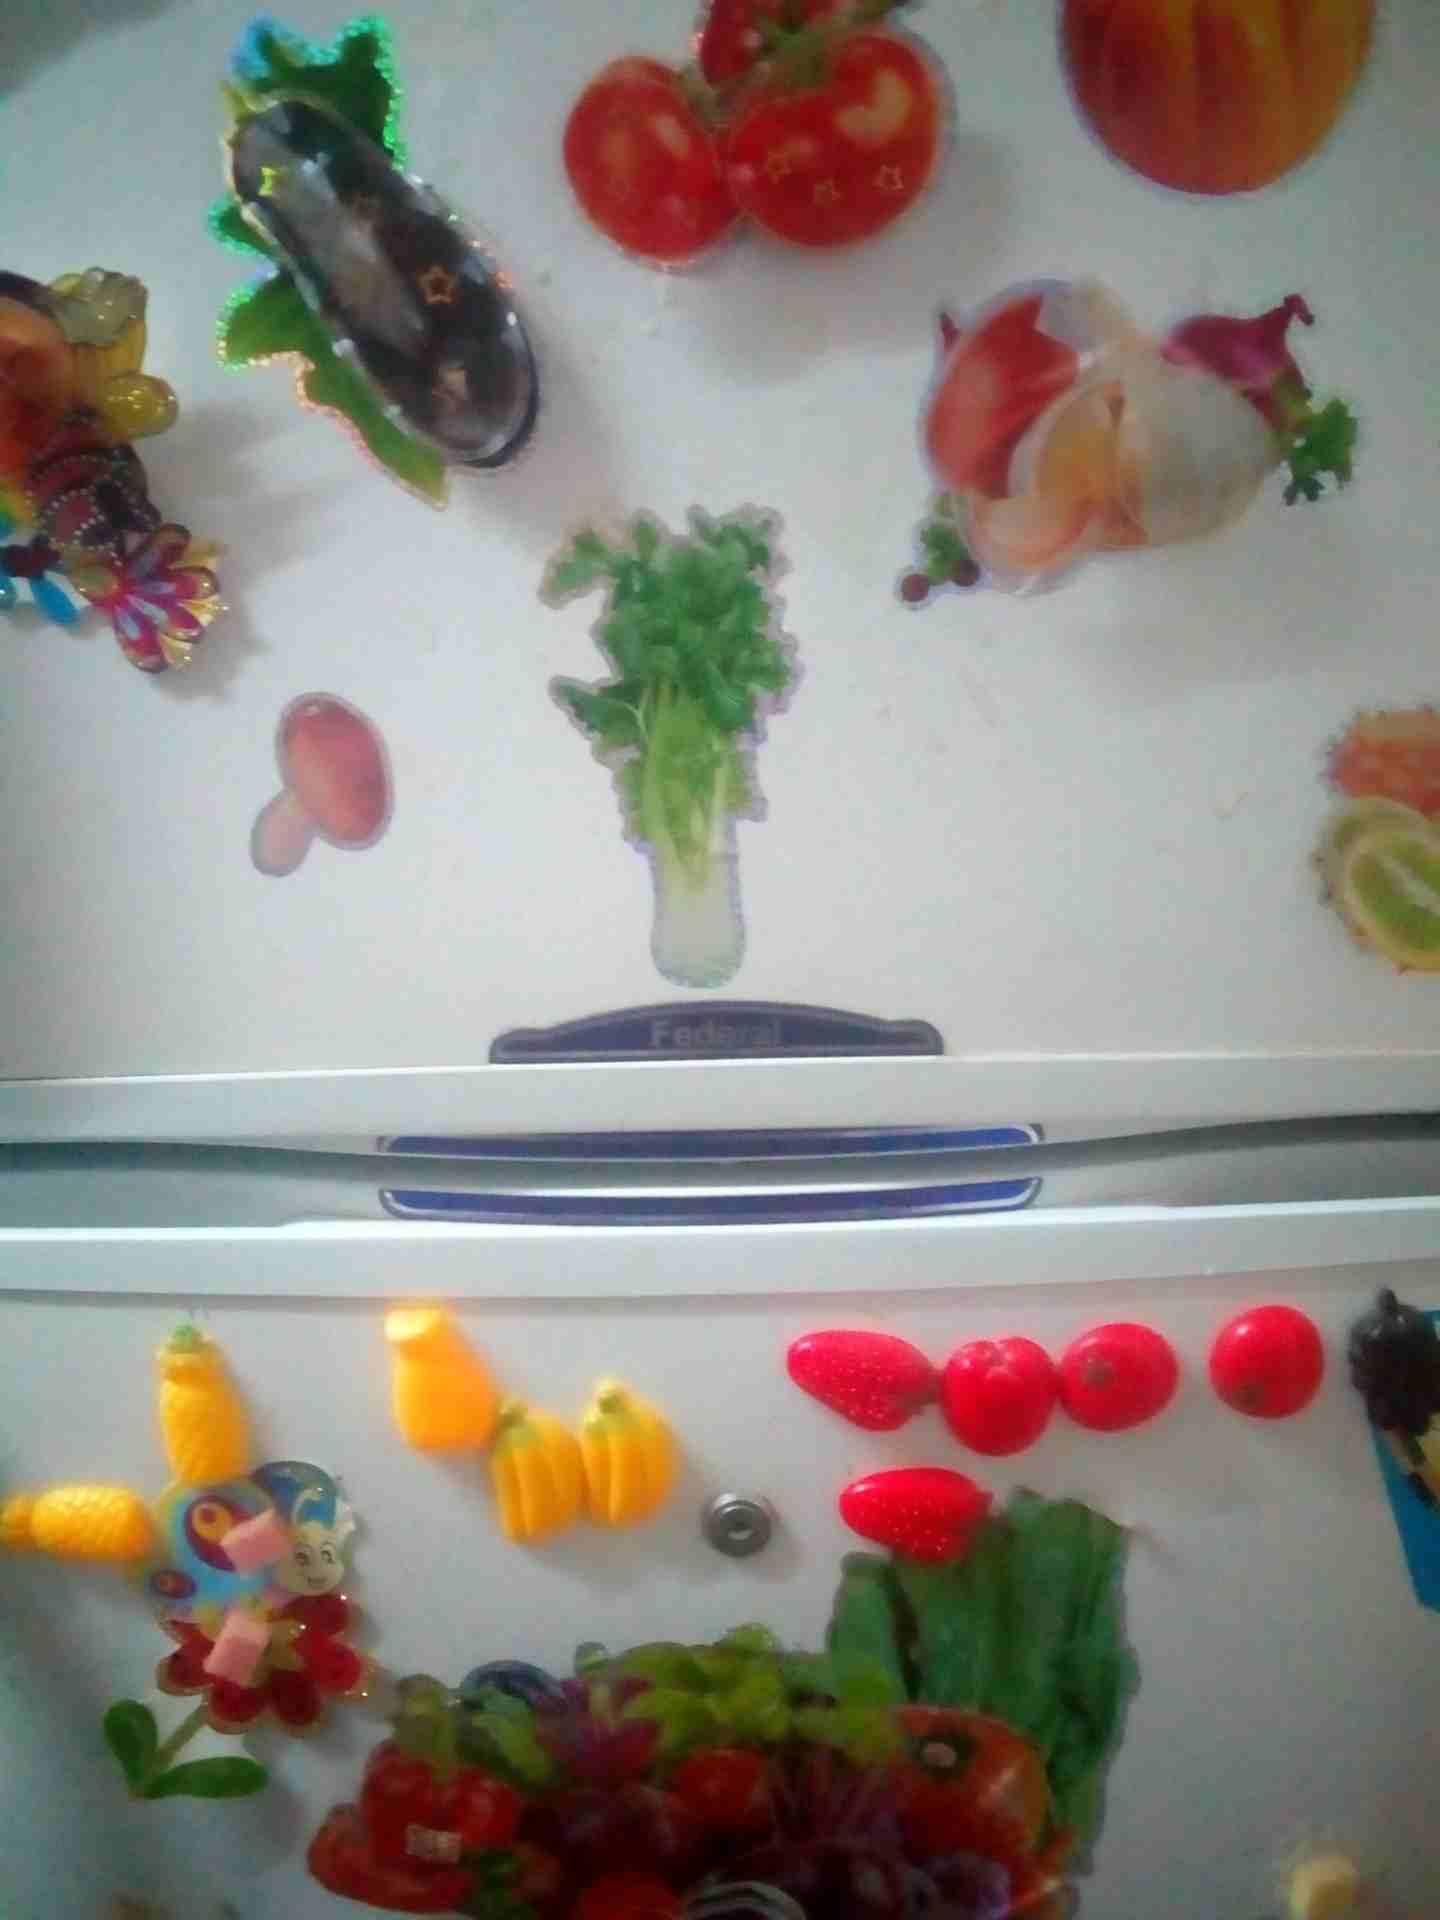 lg latest model fridge with 2doors side by side with water dispenser-  ثلاجة بحالة ممتازة نوع...